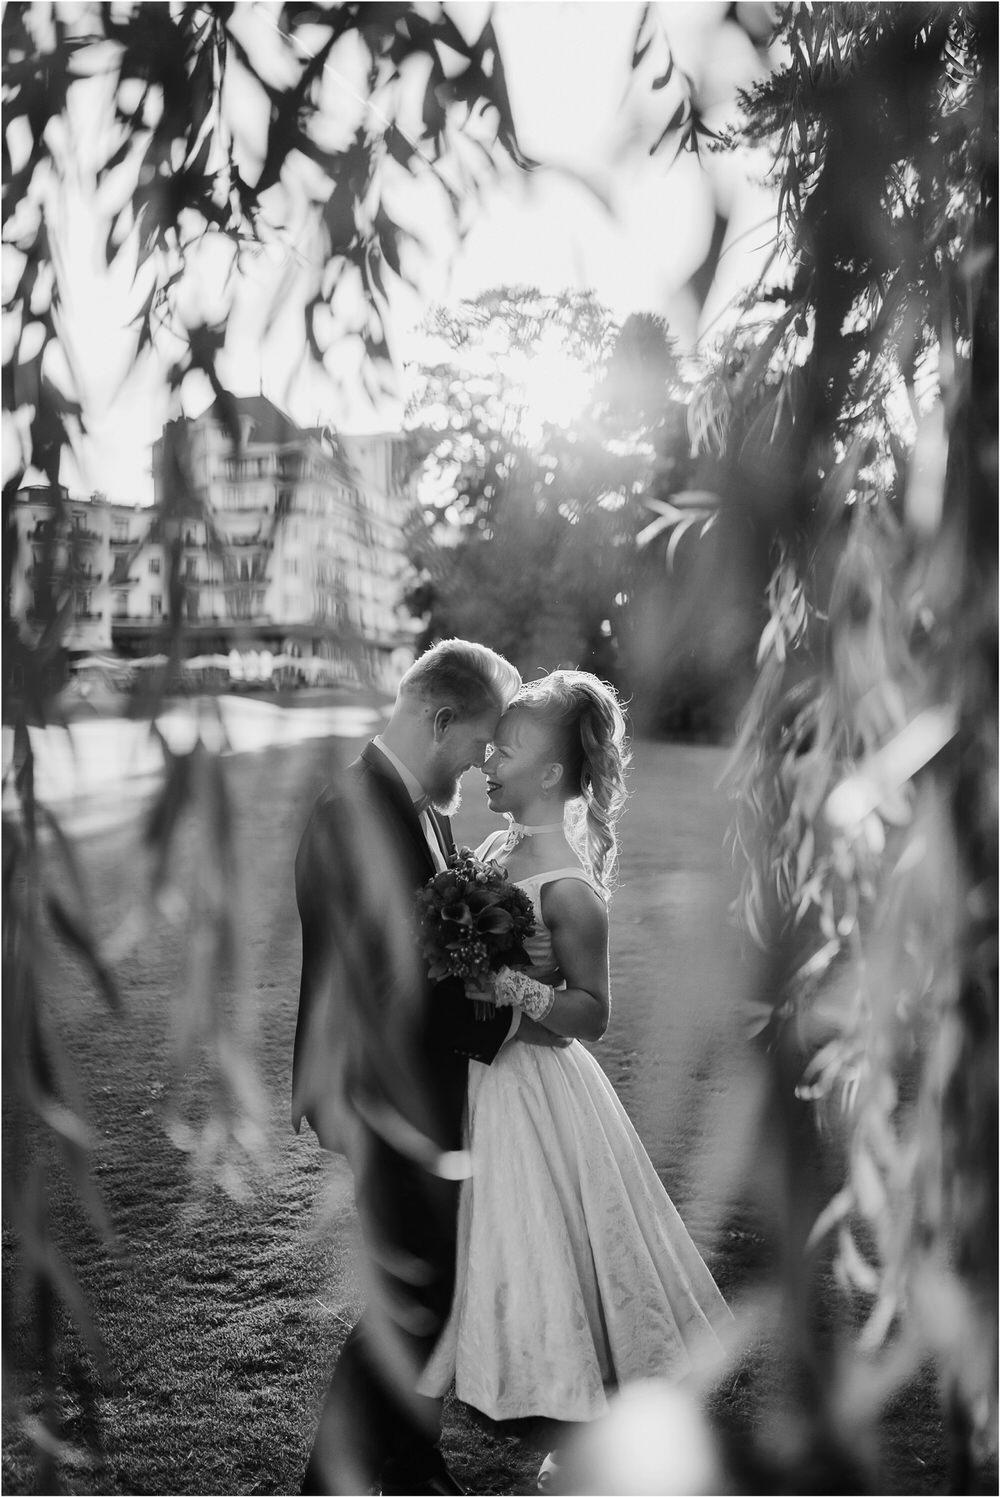 evian france wedding photographer photographer hotel royale rockabilly wedding poroka tematska nika grega themed wedding 0059.jpg